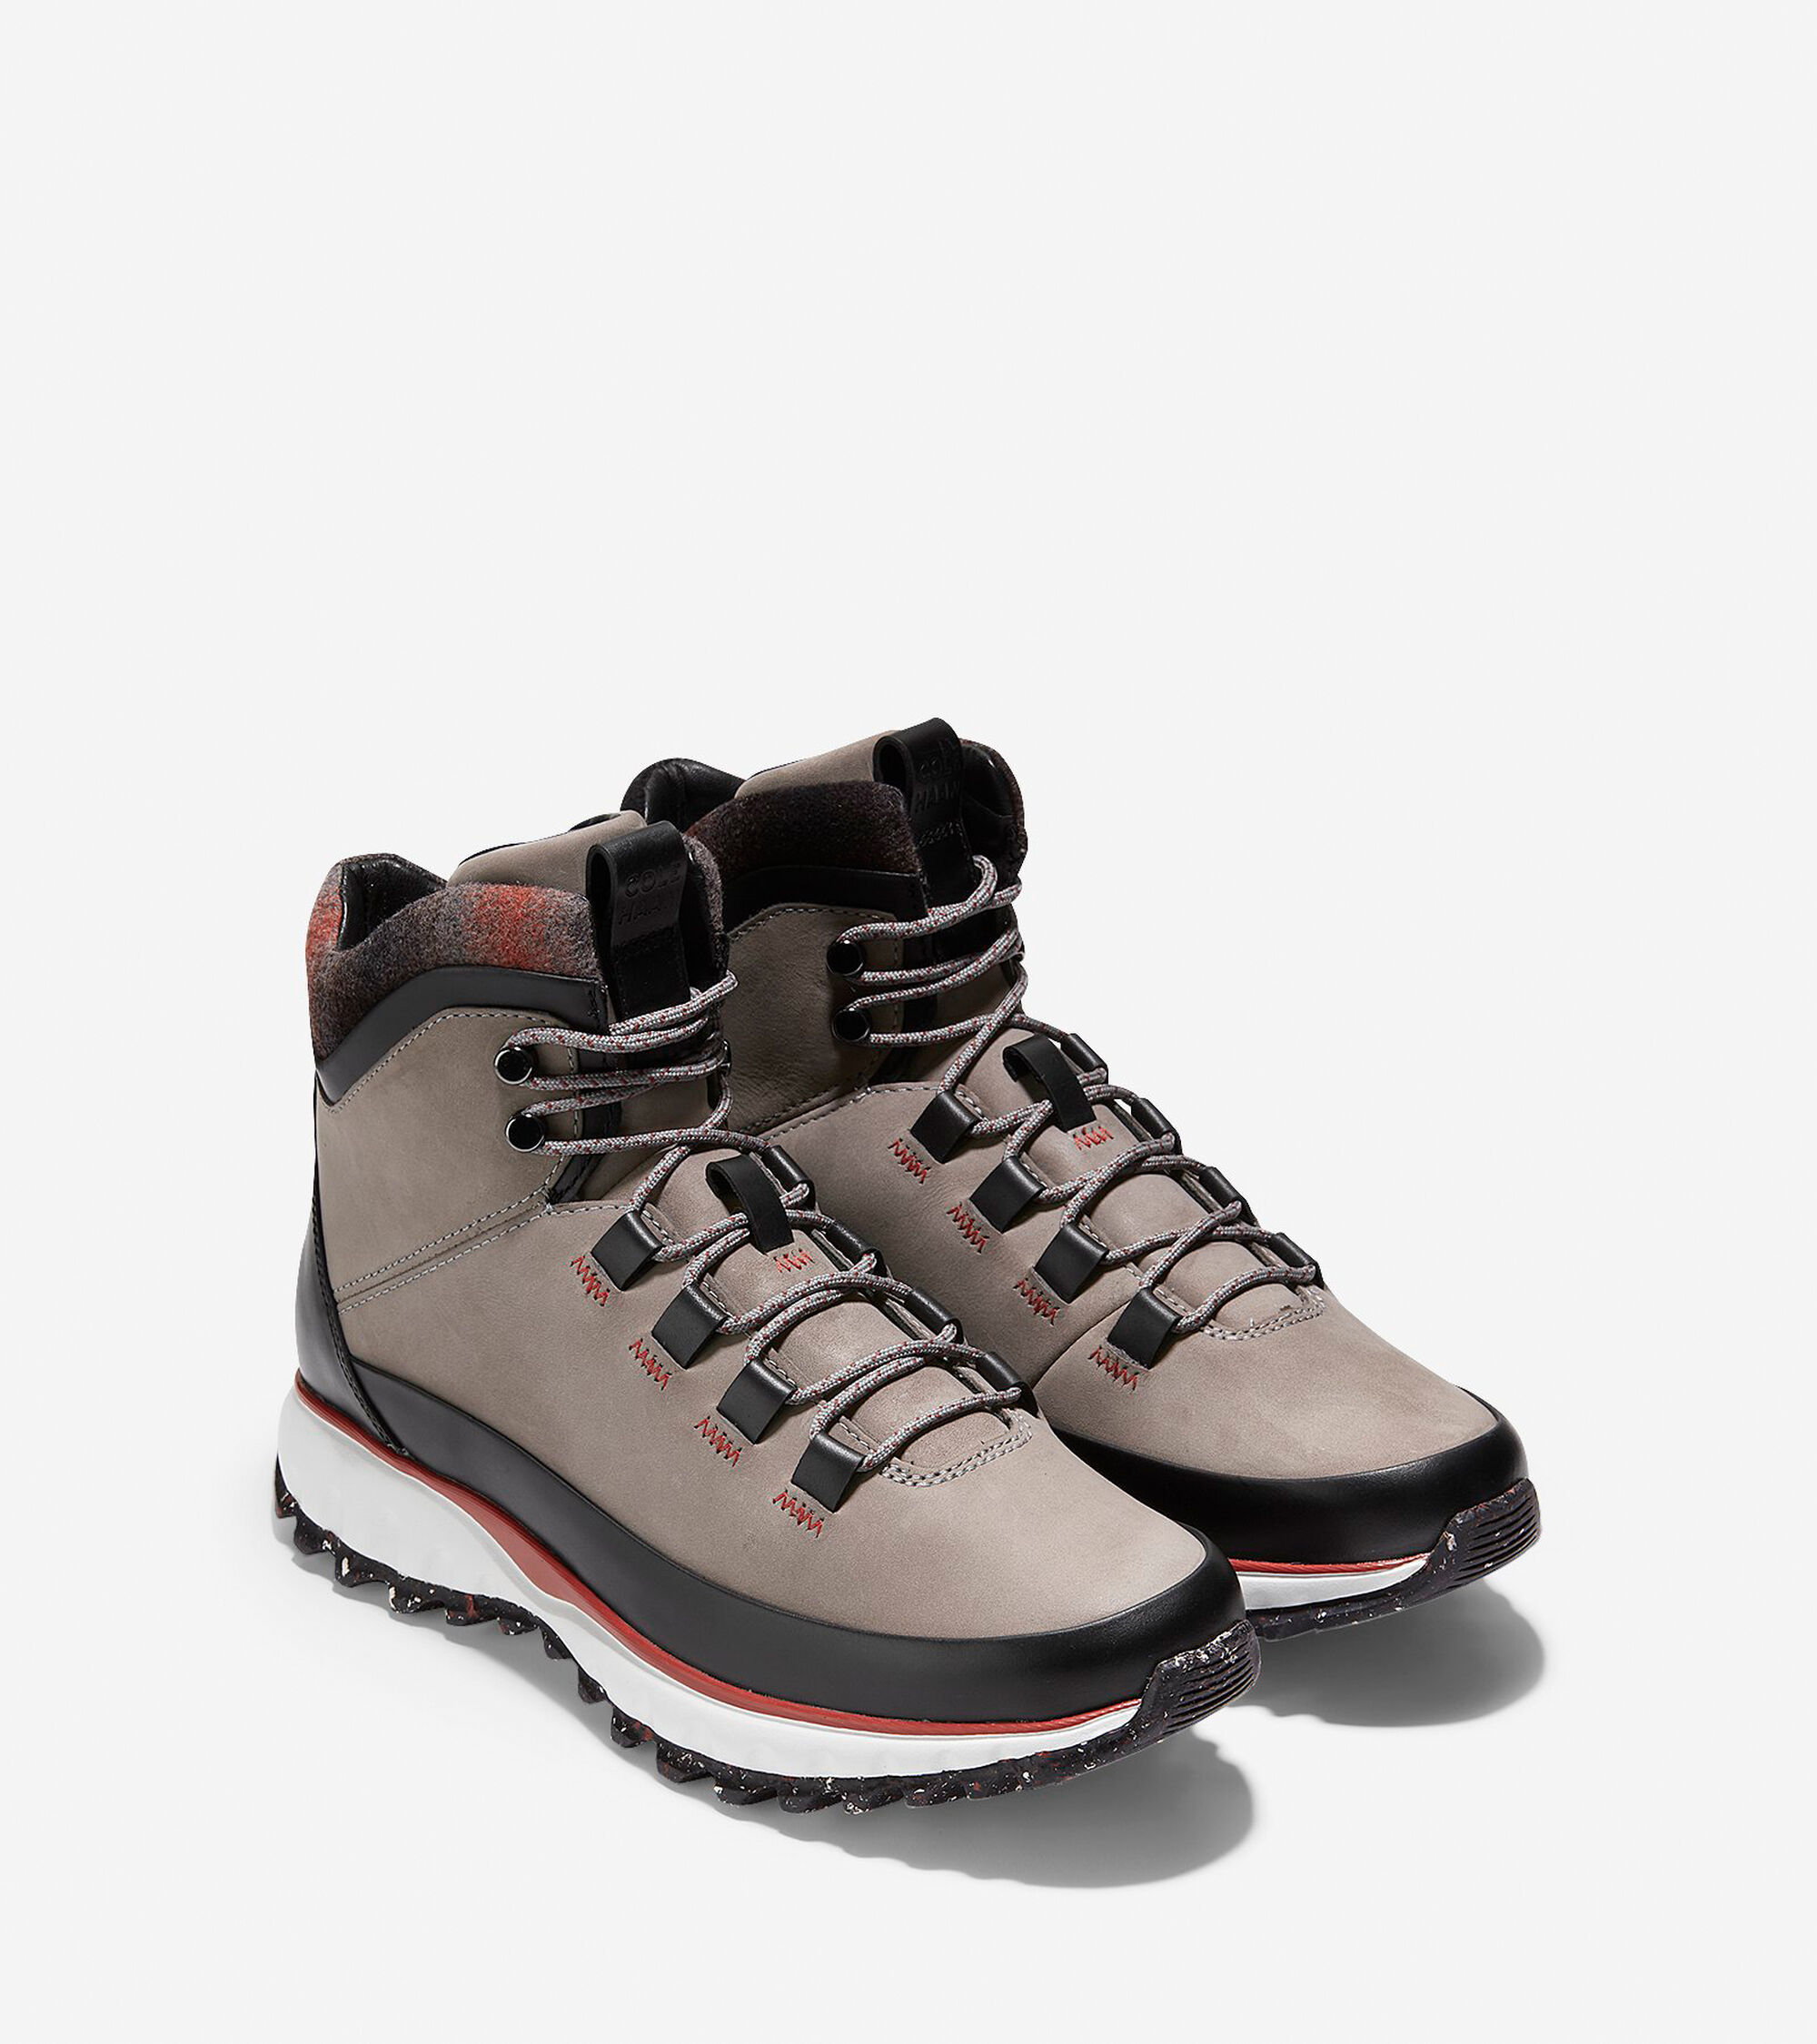 1707c86a2995 Men s ZEROGRAND All-Terrain Waterproof Hiker Boots in Ironstone ...